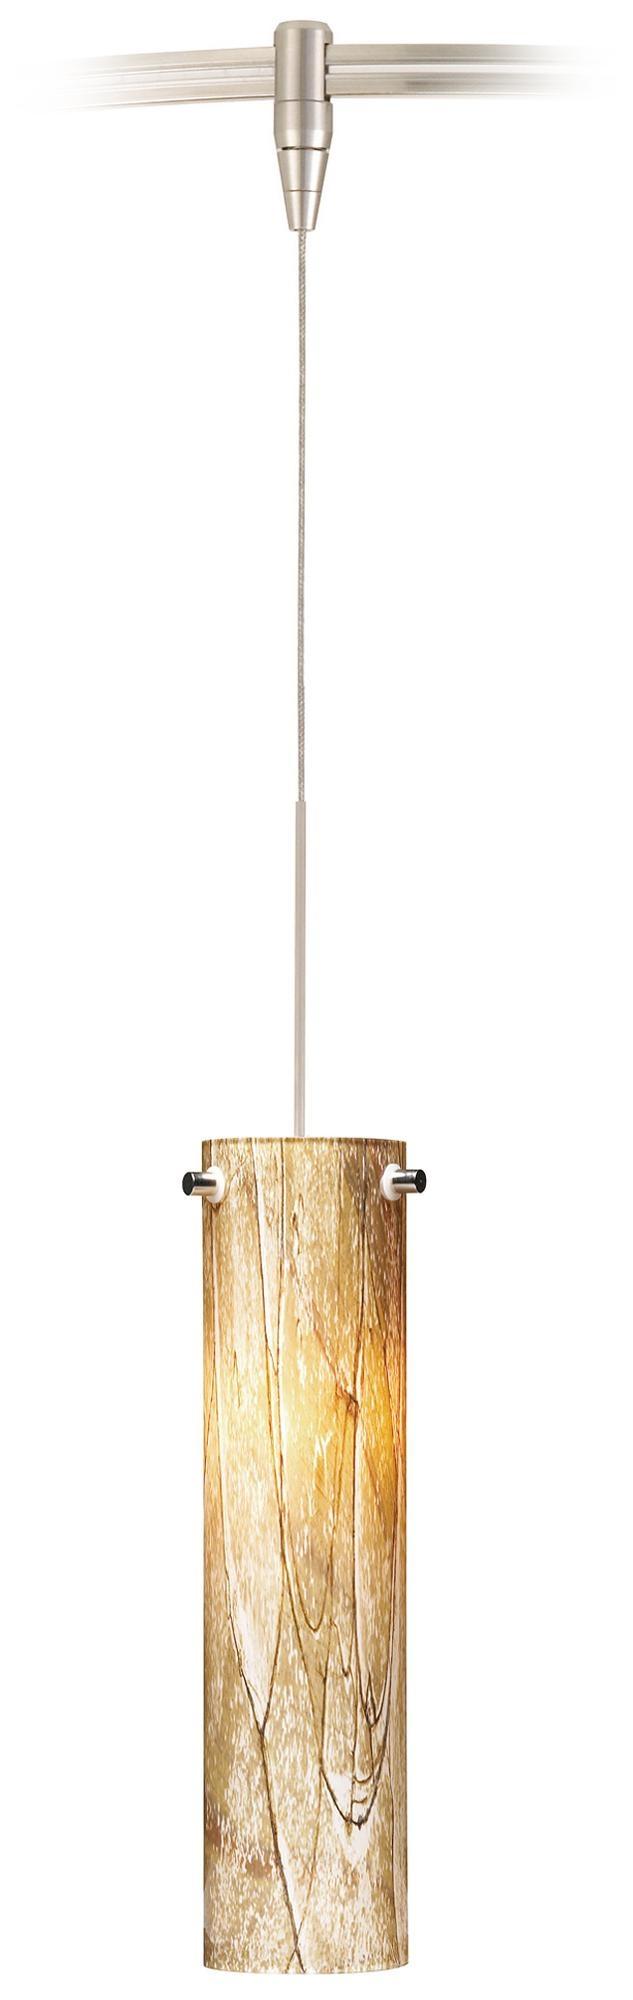 Silva Blown Glass Tech Lighting MonoRail Pendant Light -  sc 1 st  Pinterest & 18 best kitchen lighting dreams images on Pinterest | Kitchen ... azcodes.com